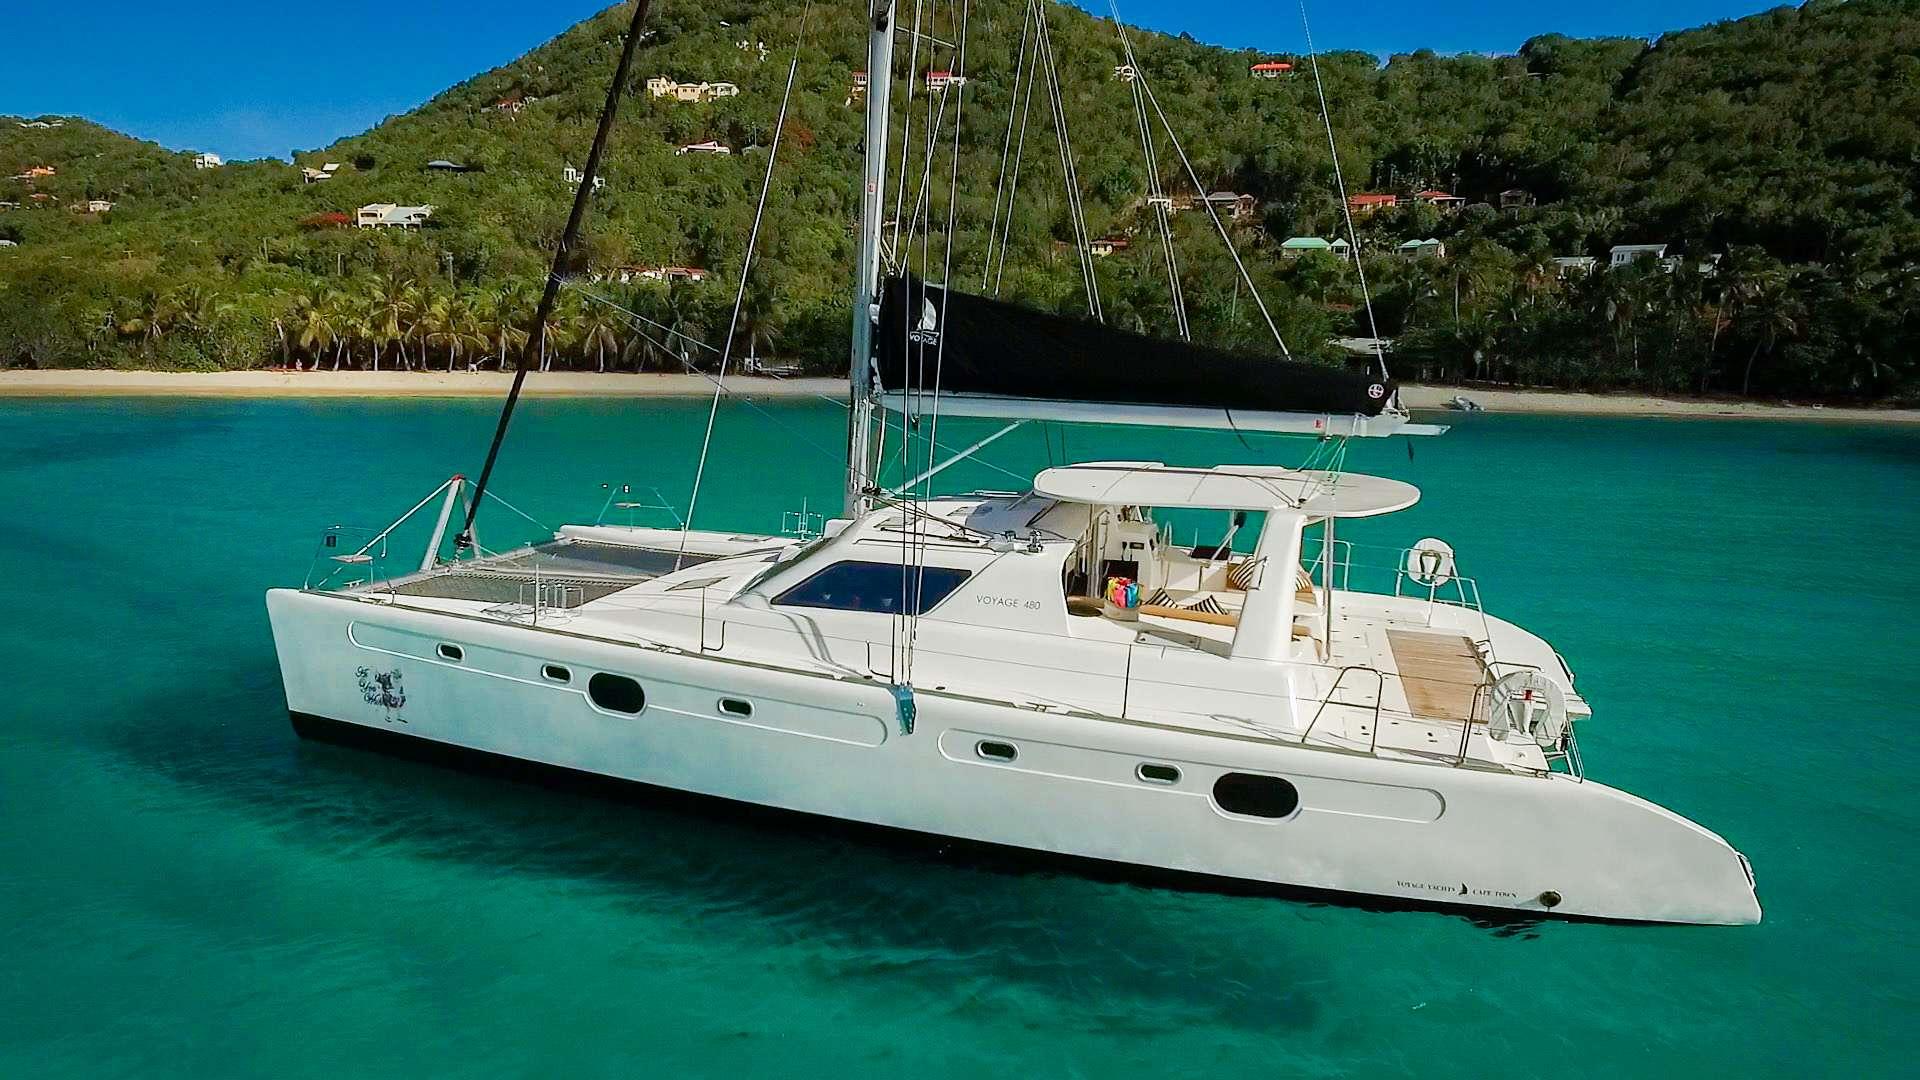 Main image of VOYAGE 480 yacht